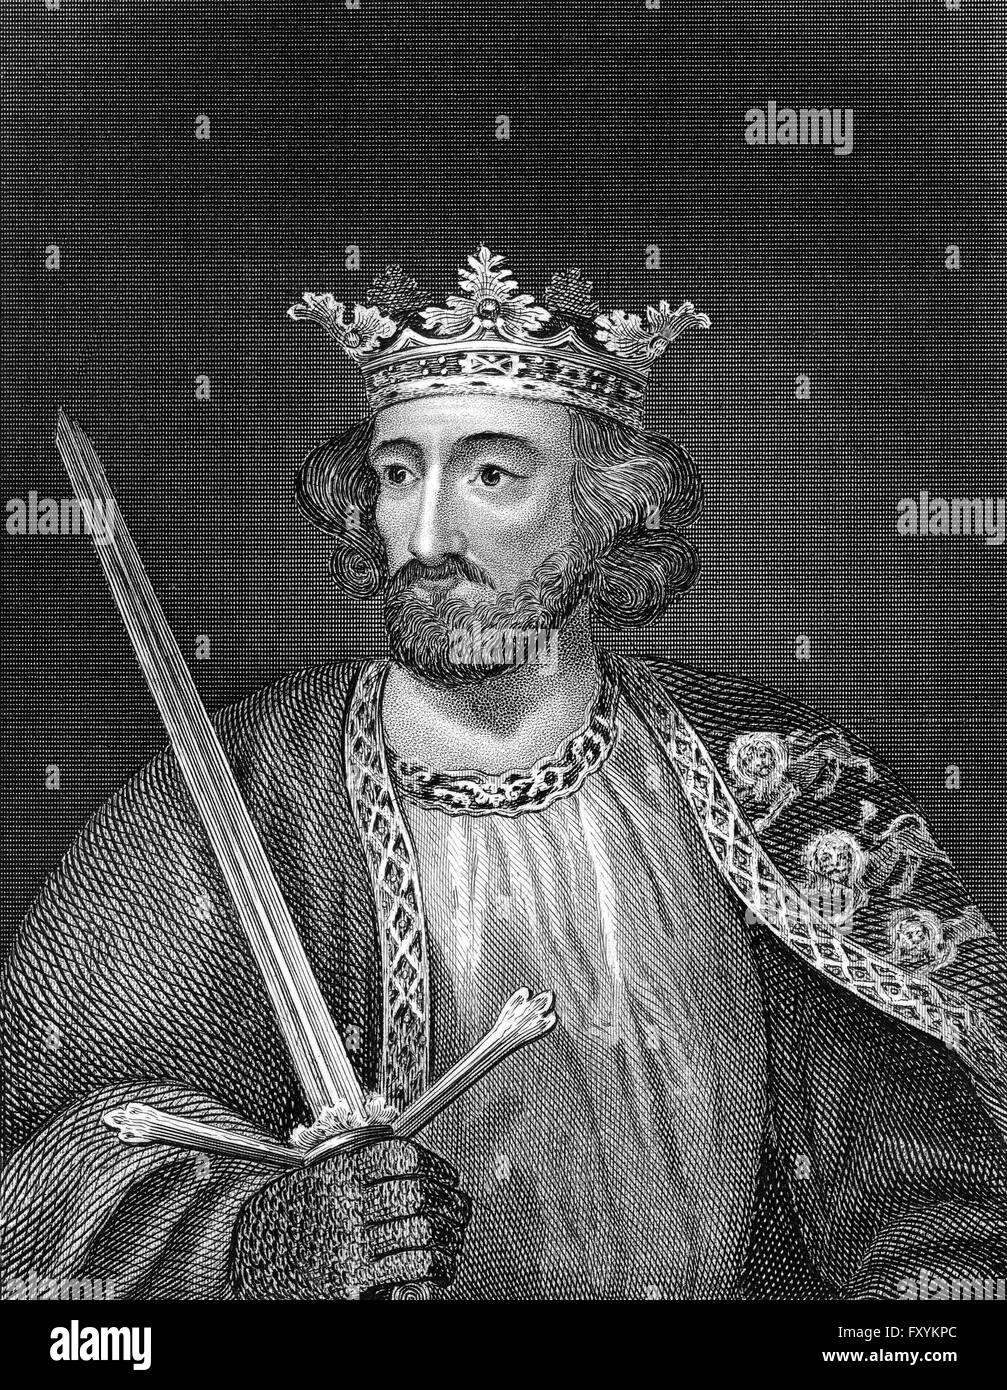 Edward I or Edward Longshanks and the Hammer of the Scots, 1239 - 1307, King of England - Stock Image